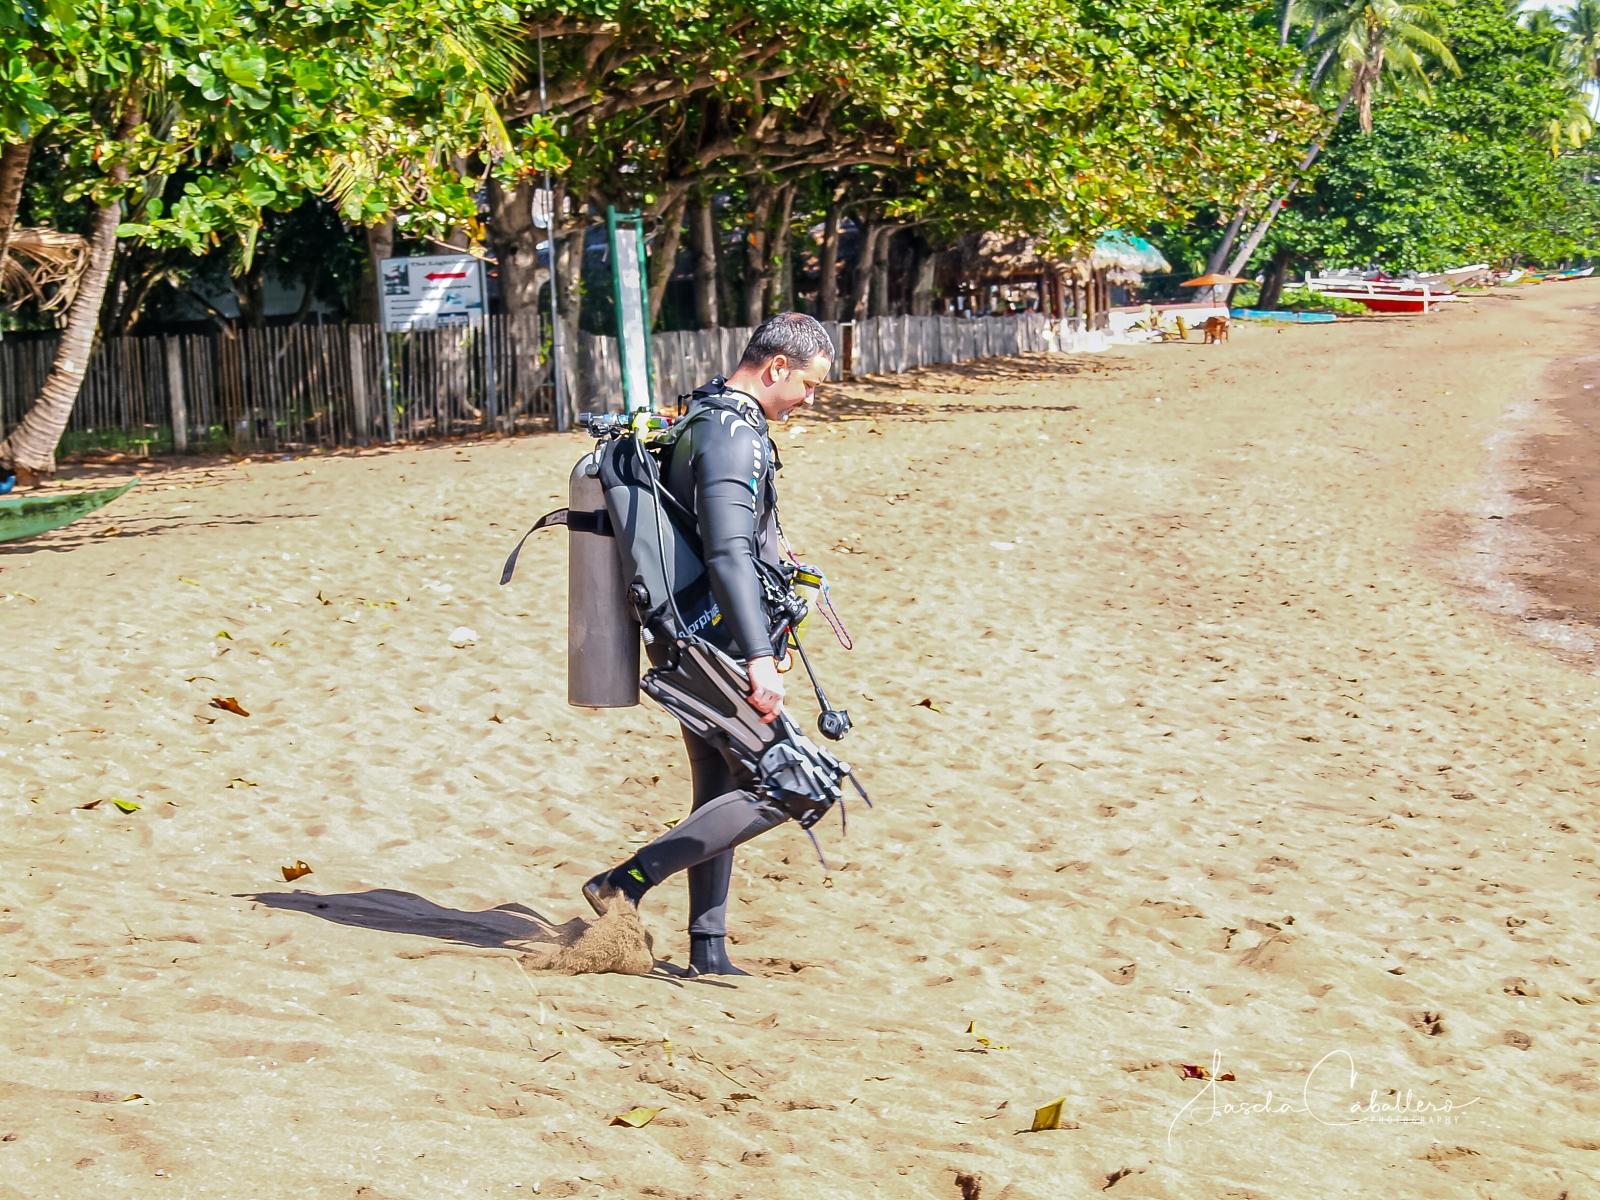 Pura Vida Beach & Dive Resort